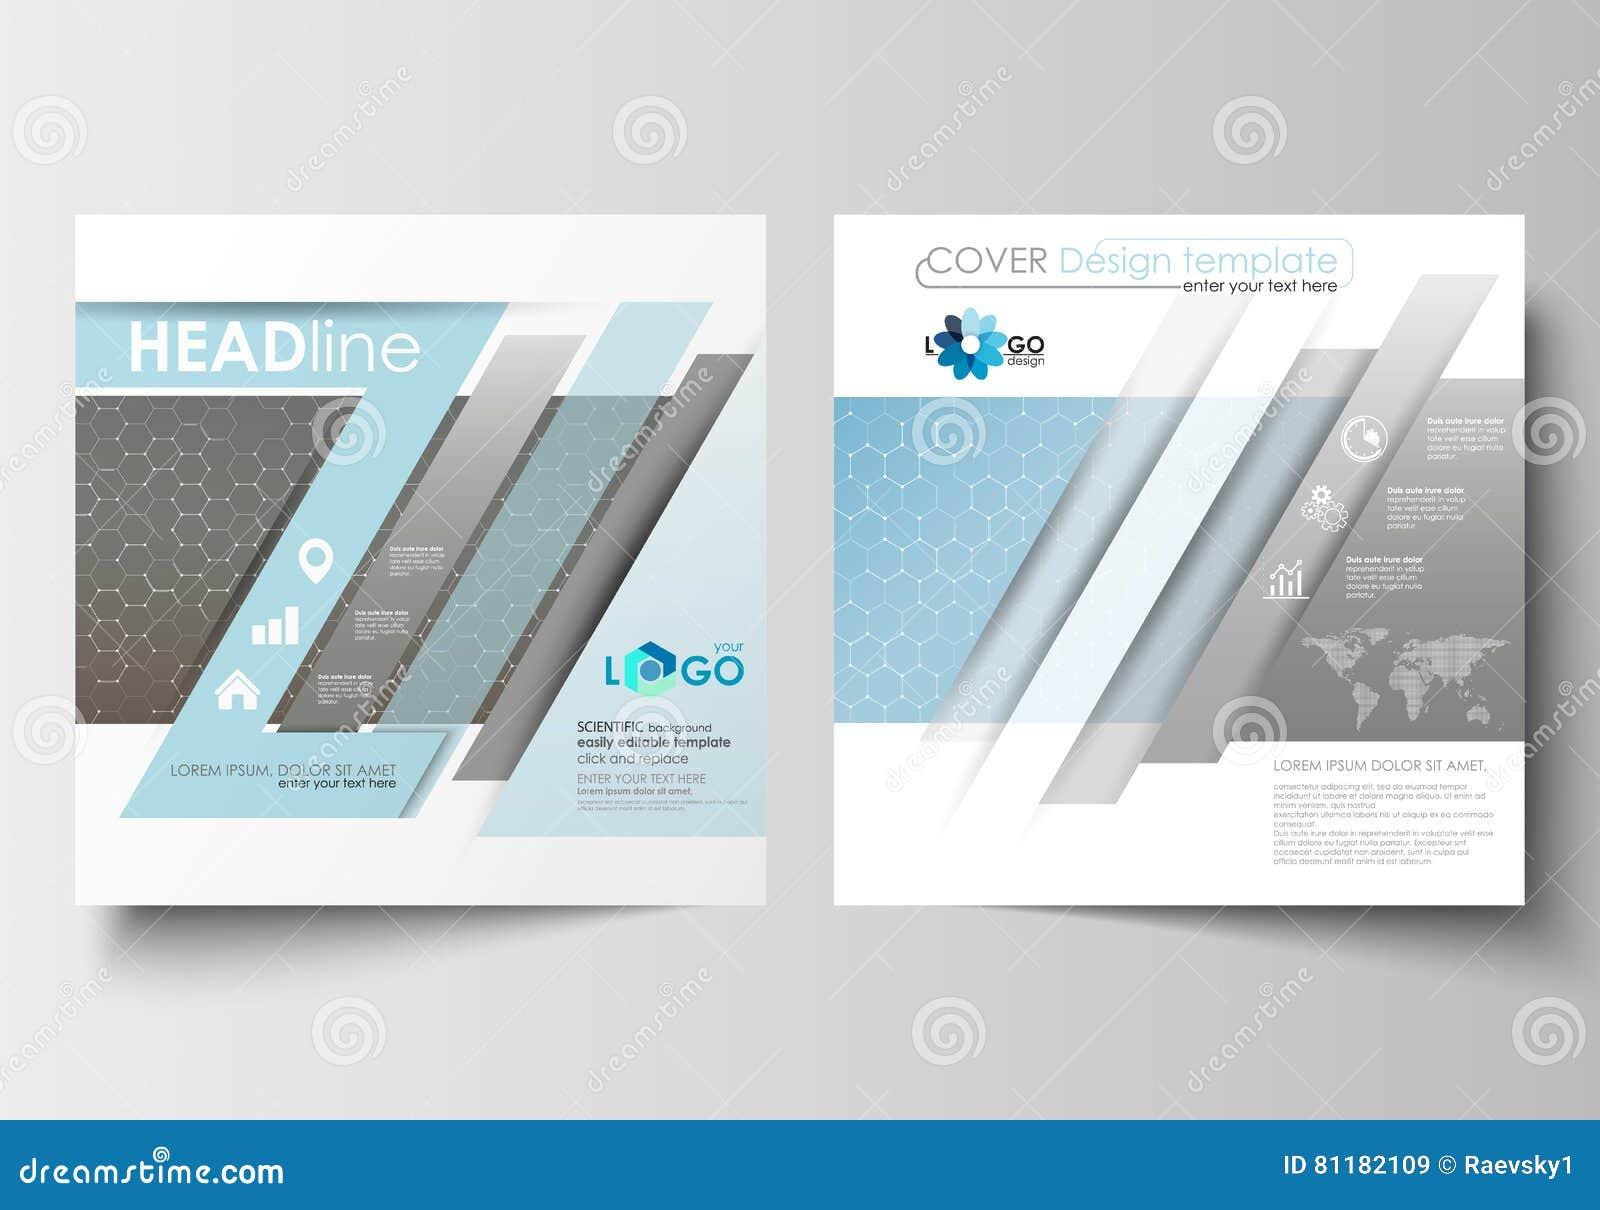 Templates For Square Brochure, Magazine, Flyer, Booklet. Leaflet ...